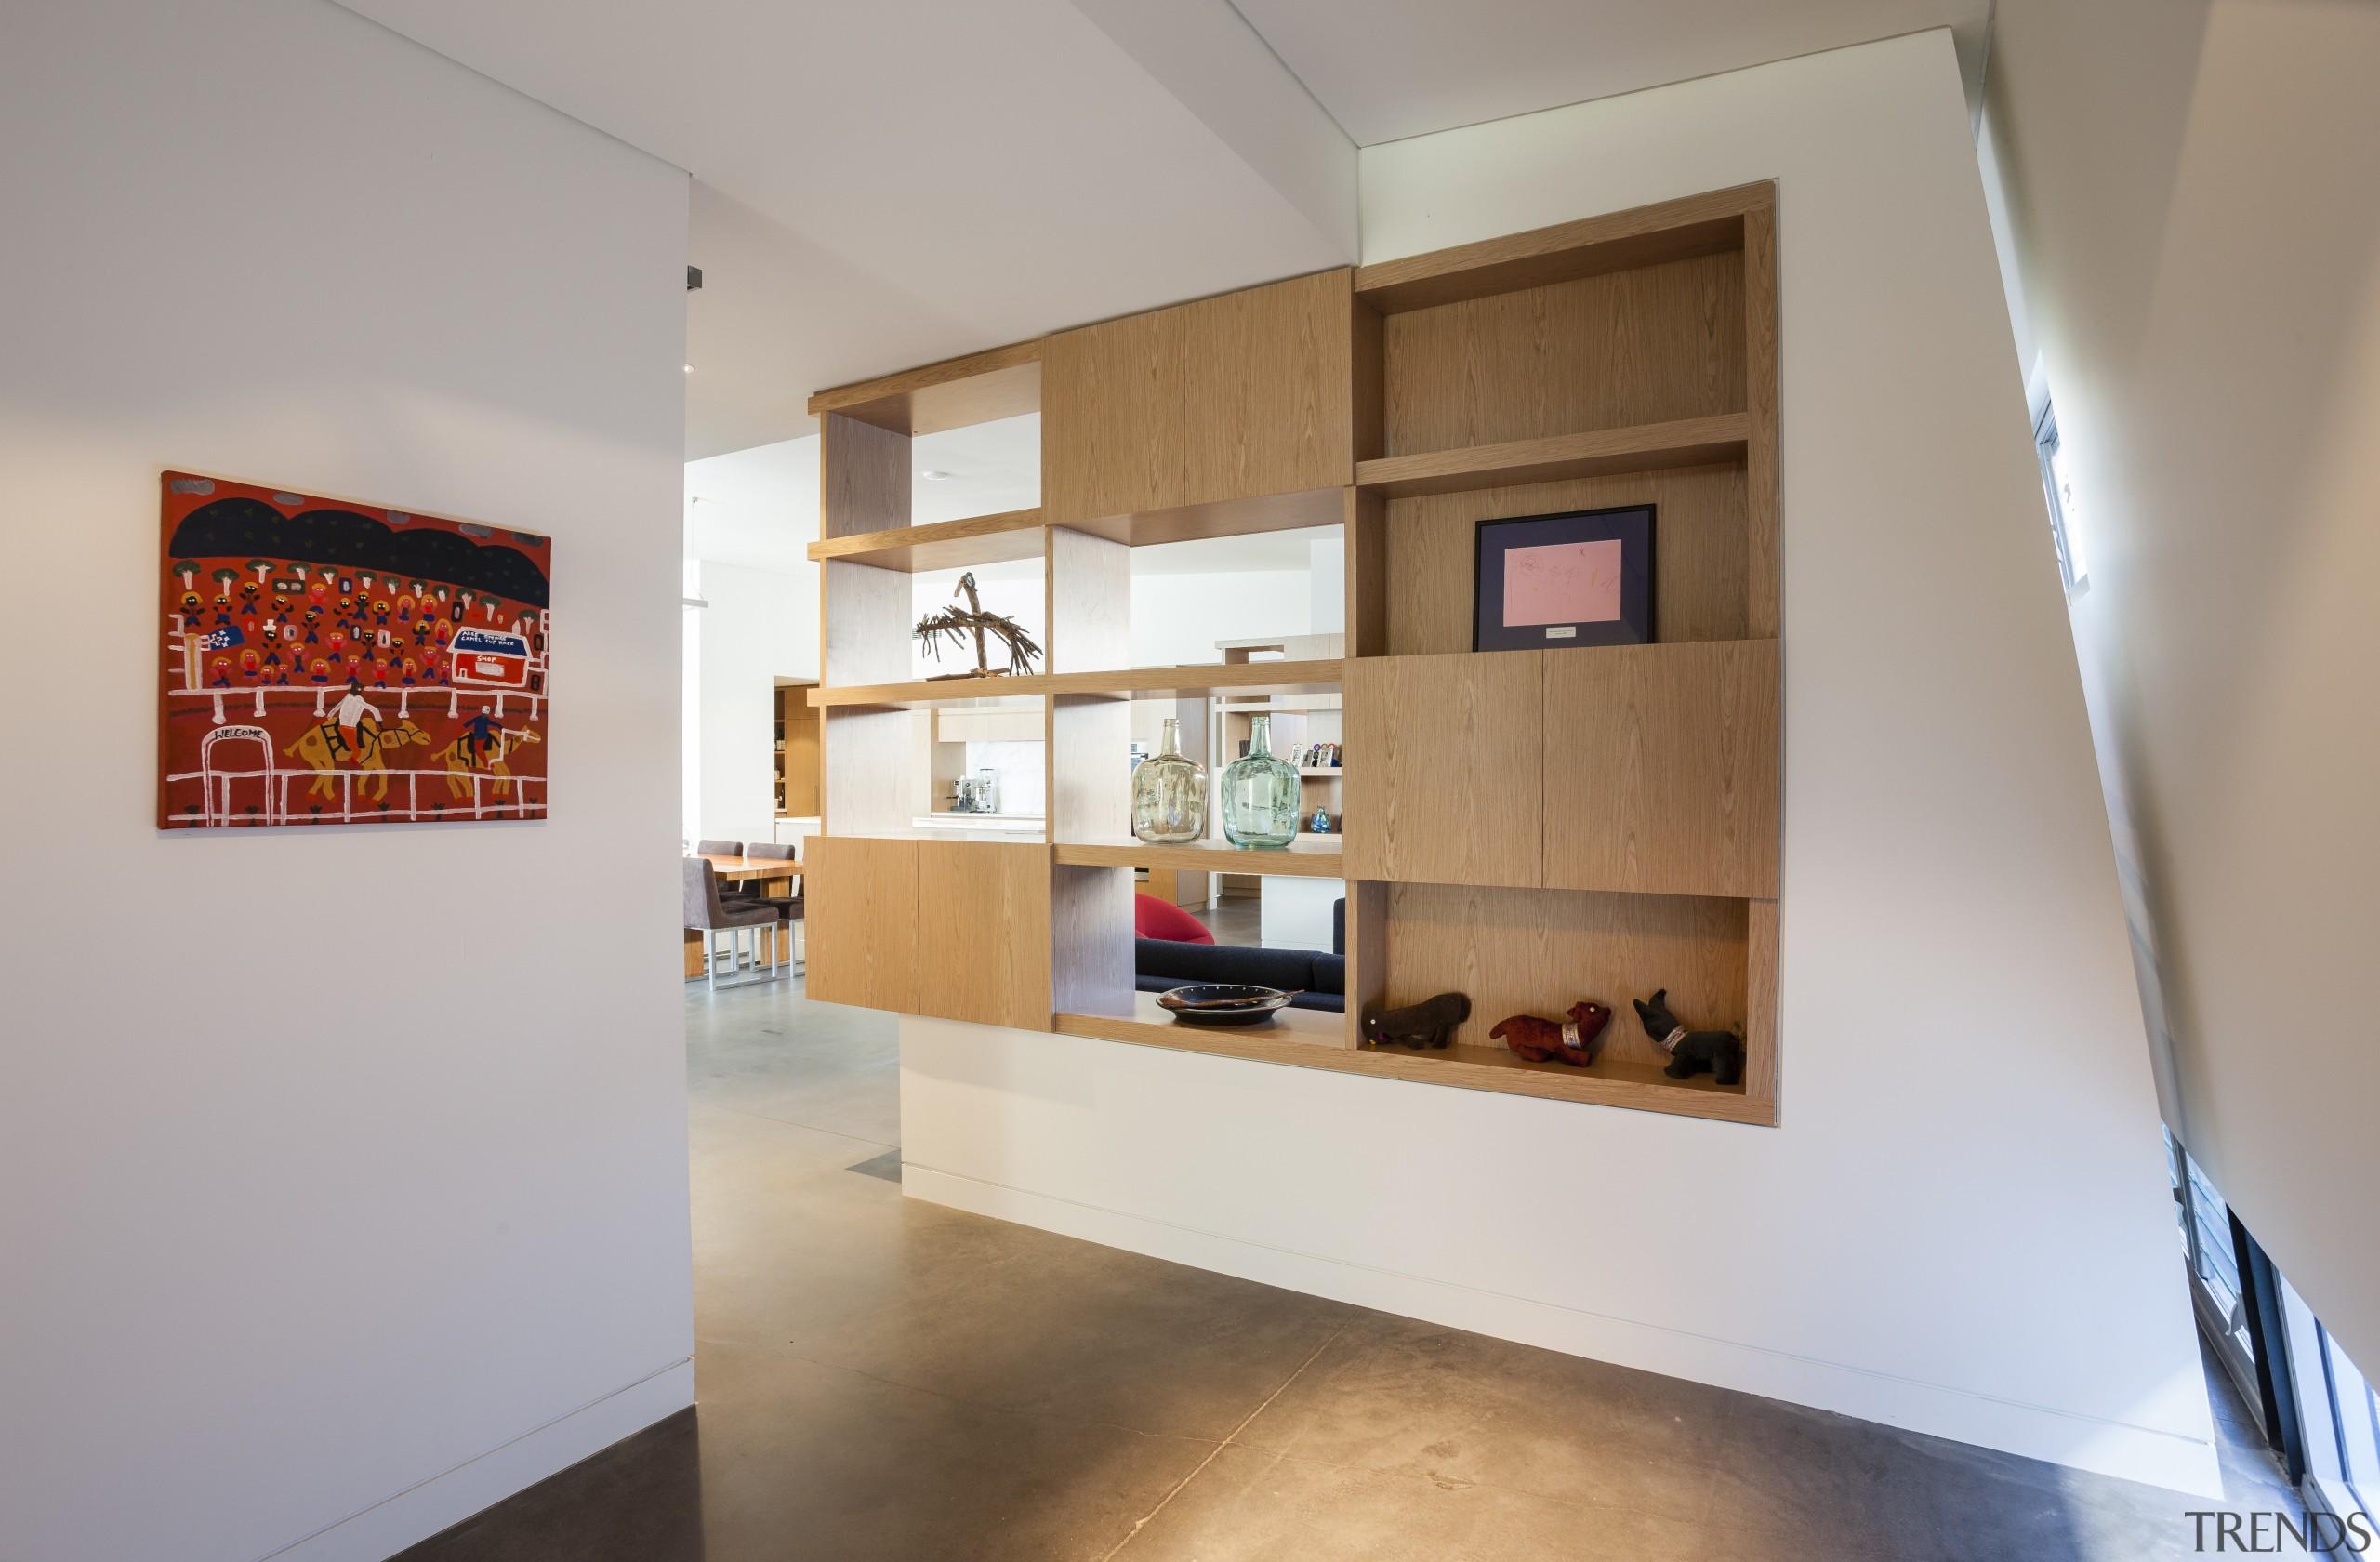 Interior shot - Interior shot - architecture | architecture, furniture, house, interior design, product design, shelf, gray